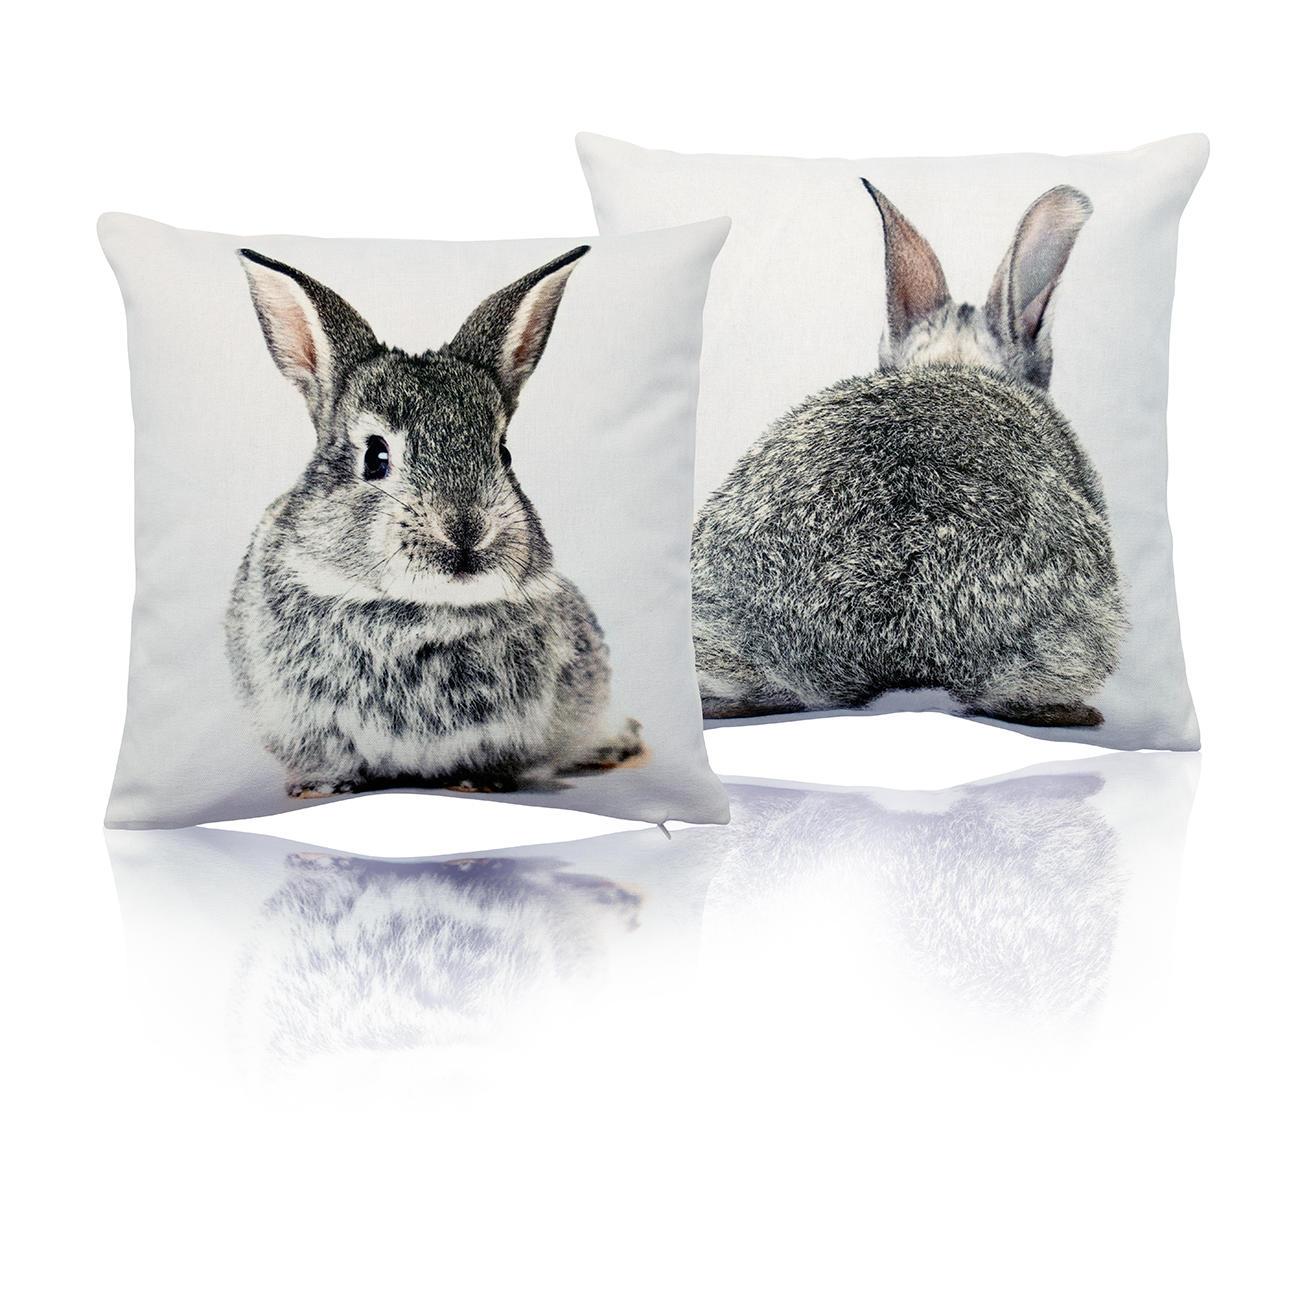 mars more wendekissen hase 33 x 33 cm online kaufen. Black Bedroom Furniture Sets. Home Design Ideas